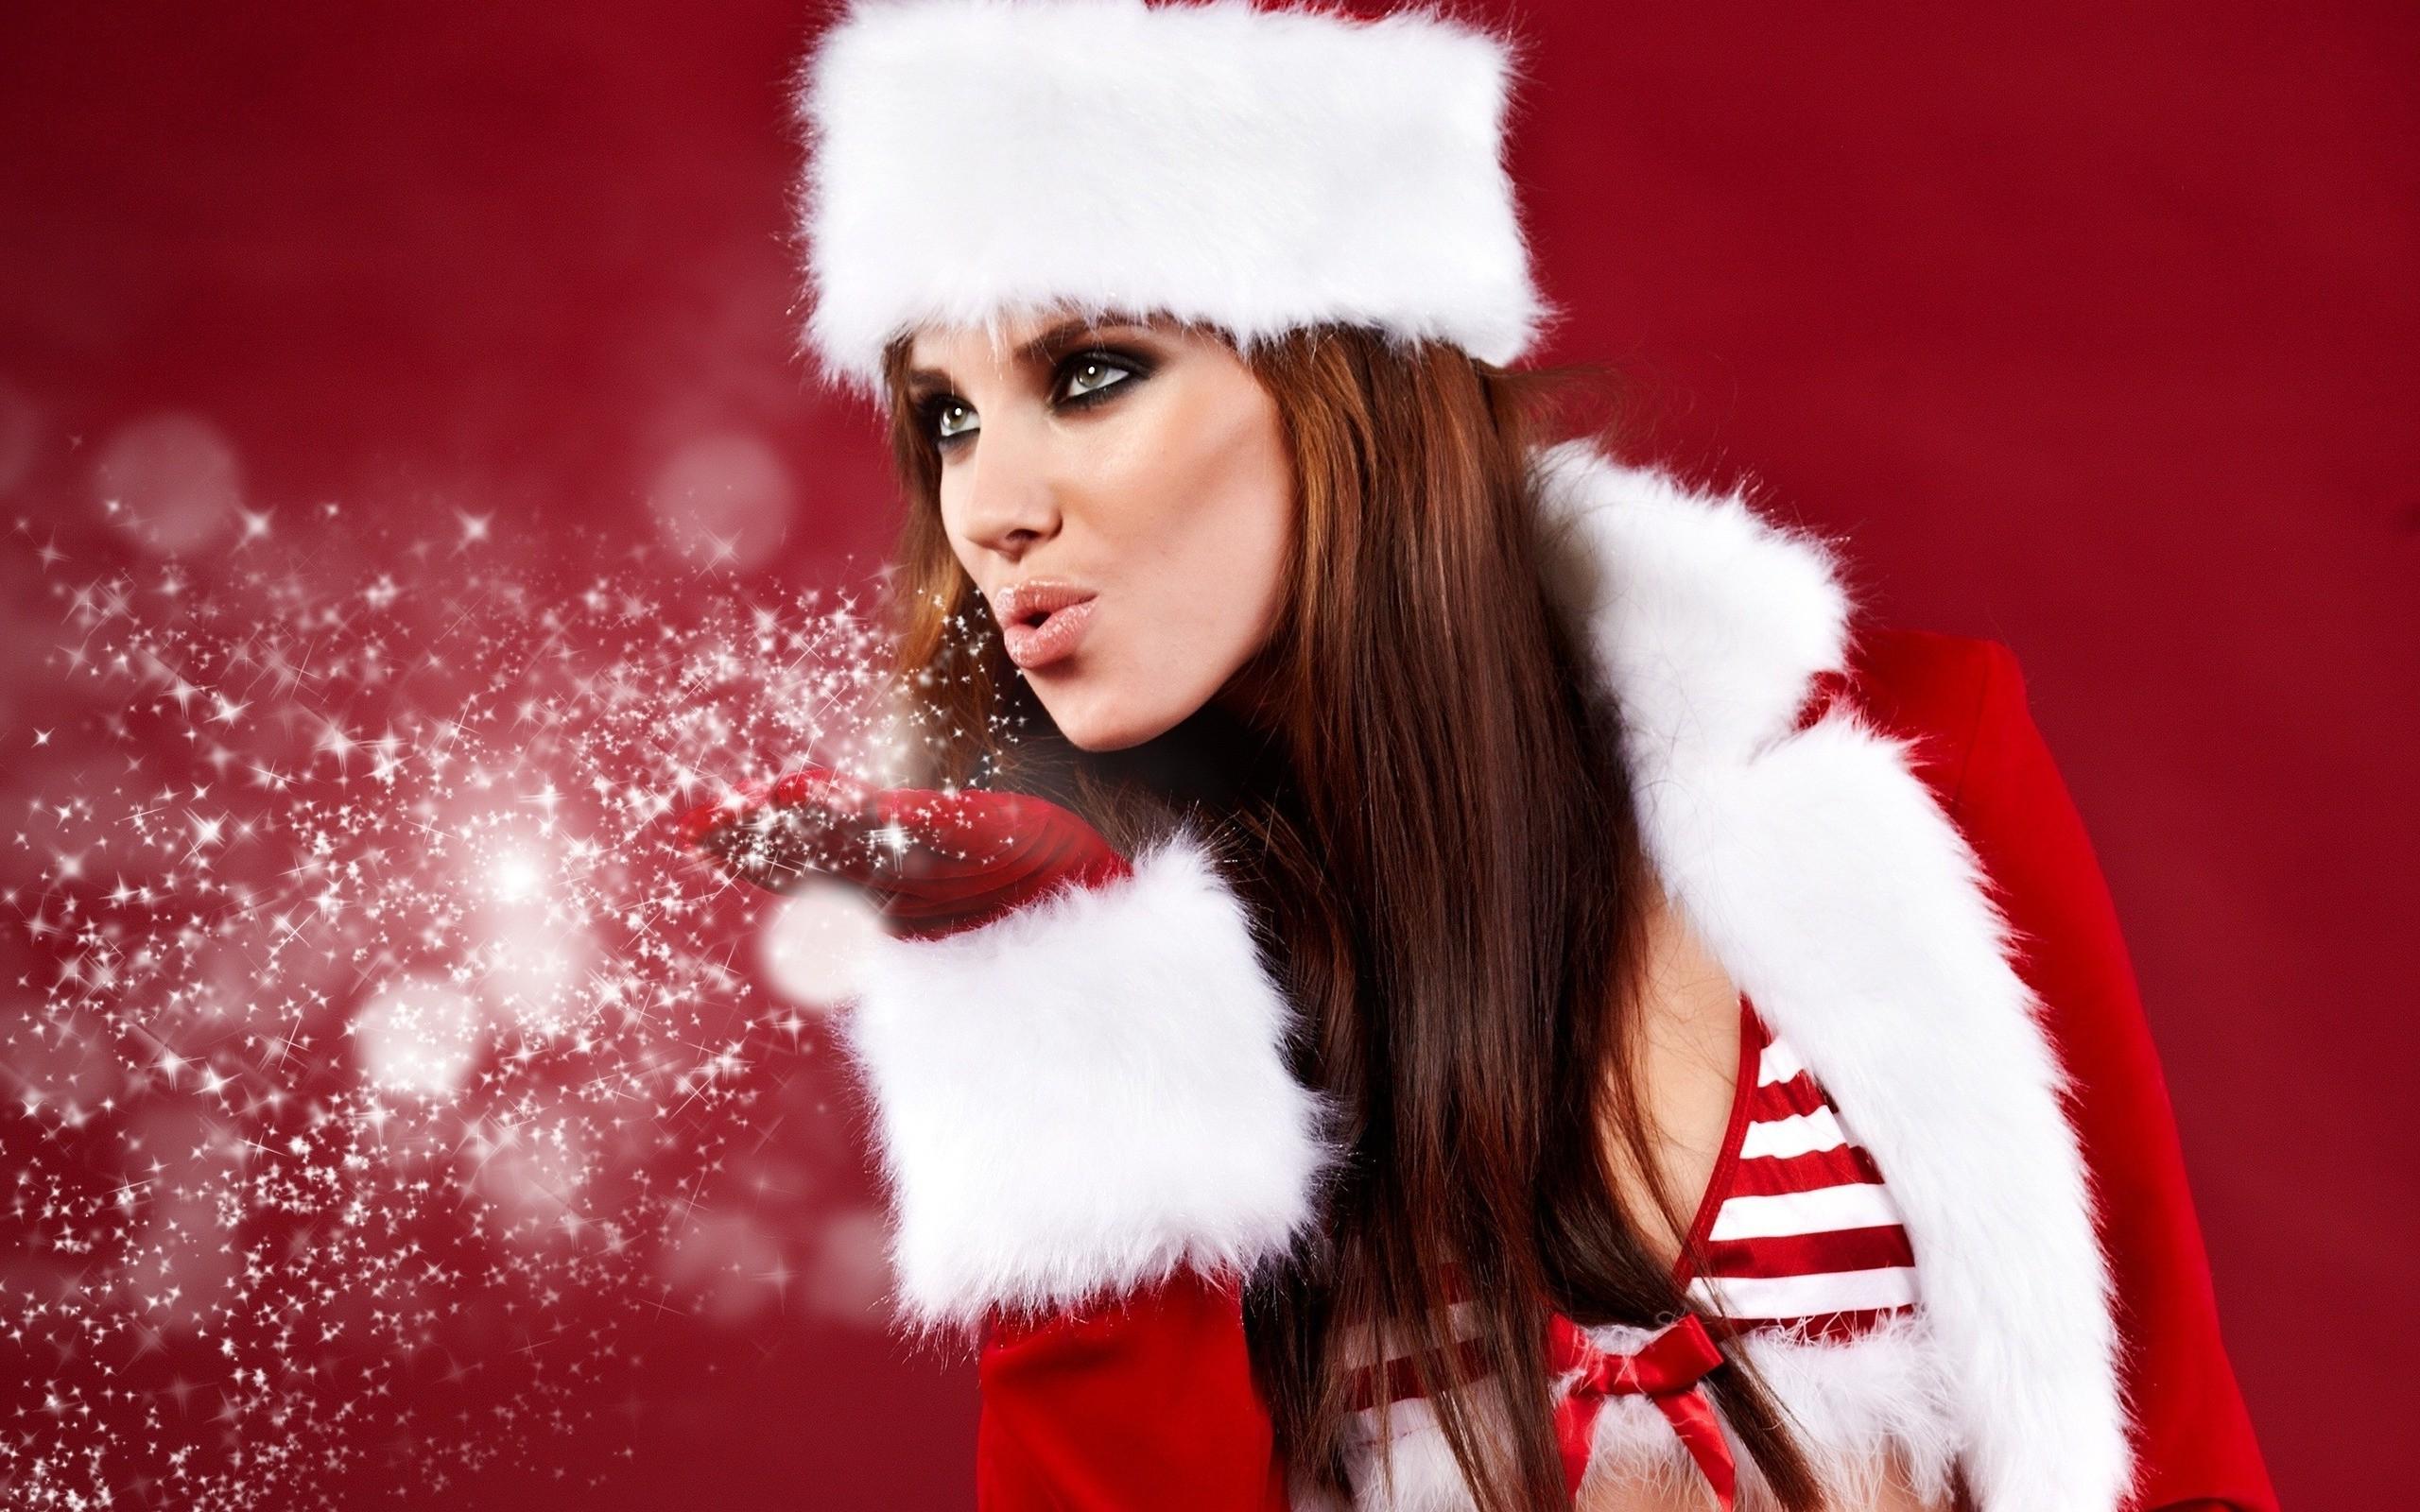 Christmas Model.Wallpaper 2560x1600 Px Christmas Model Women 2560x1600